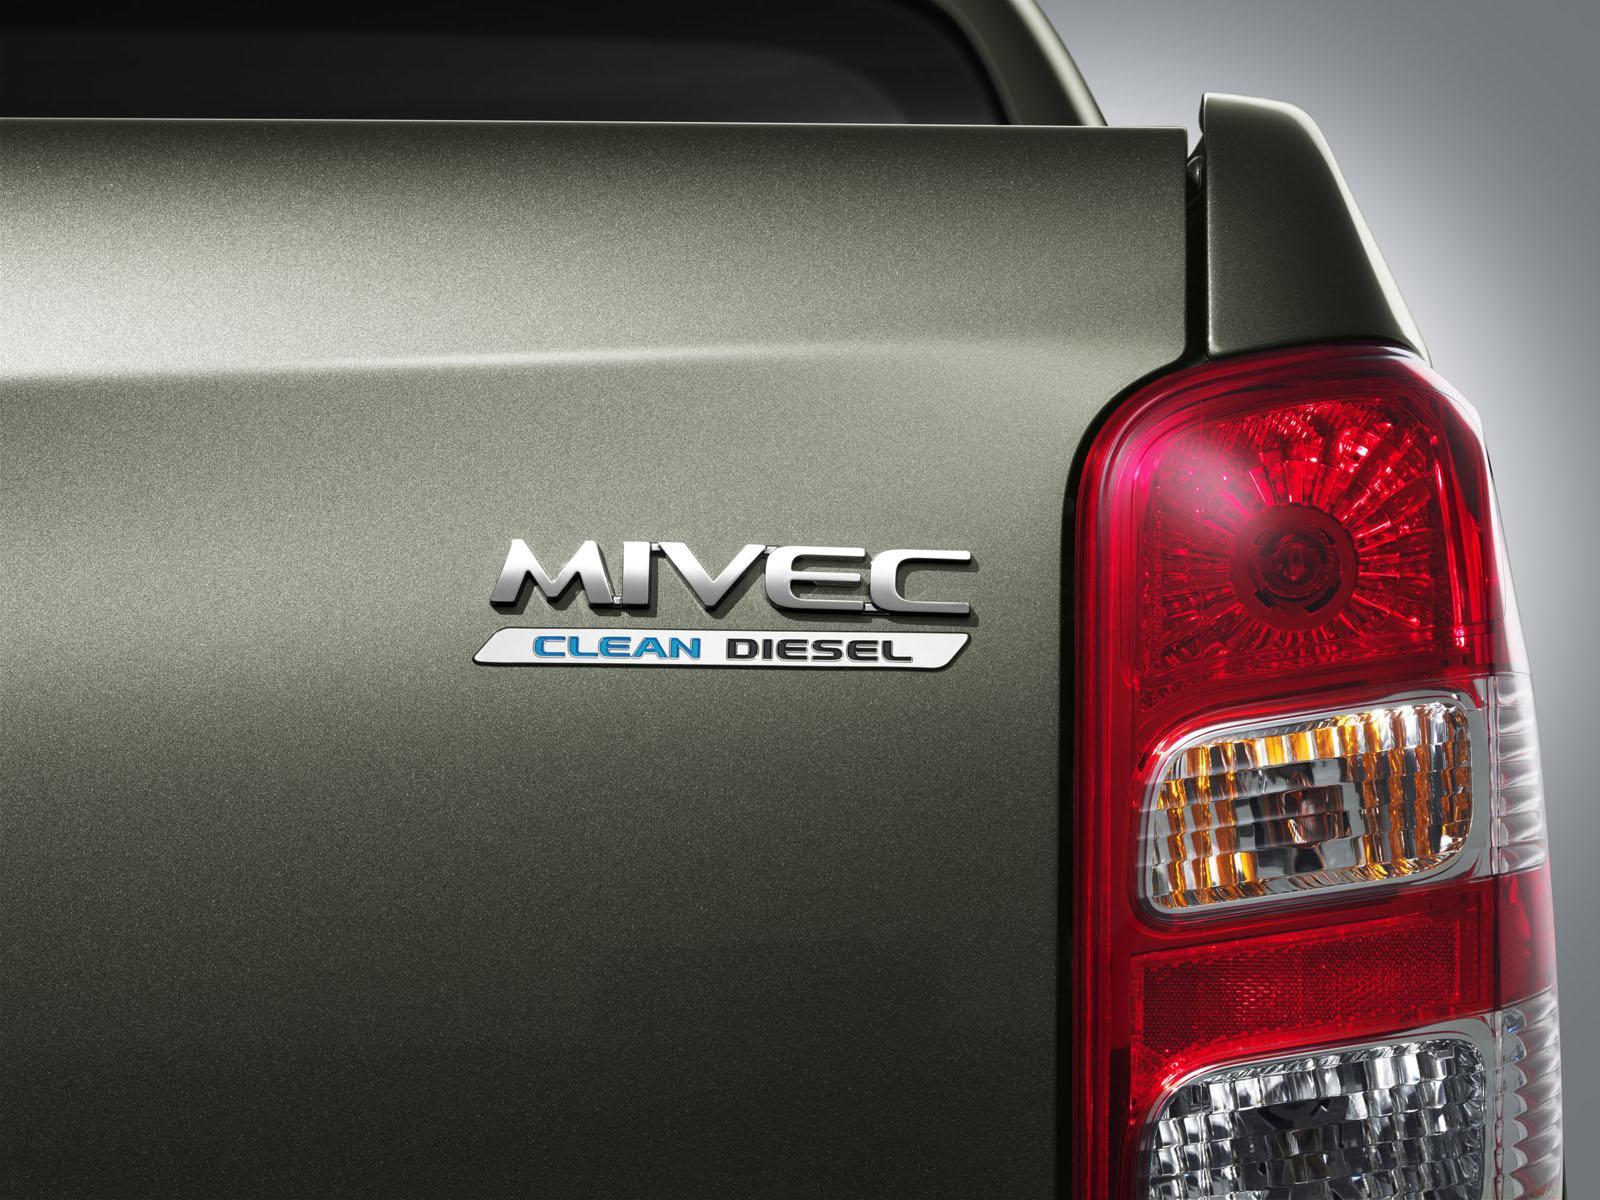 2015 Mitsubishi Triton badge